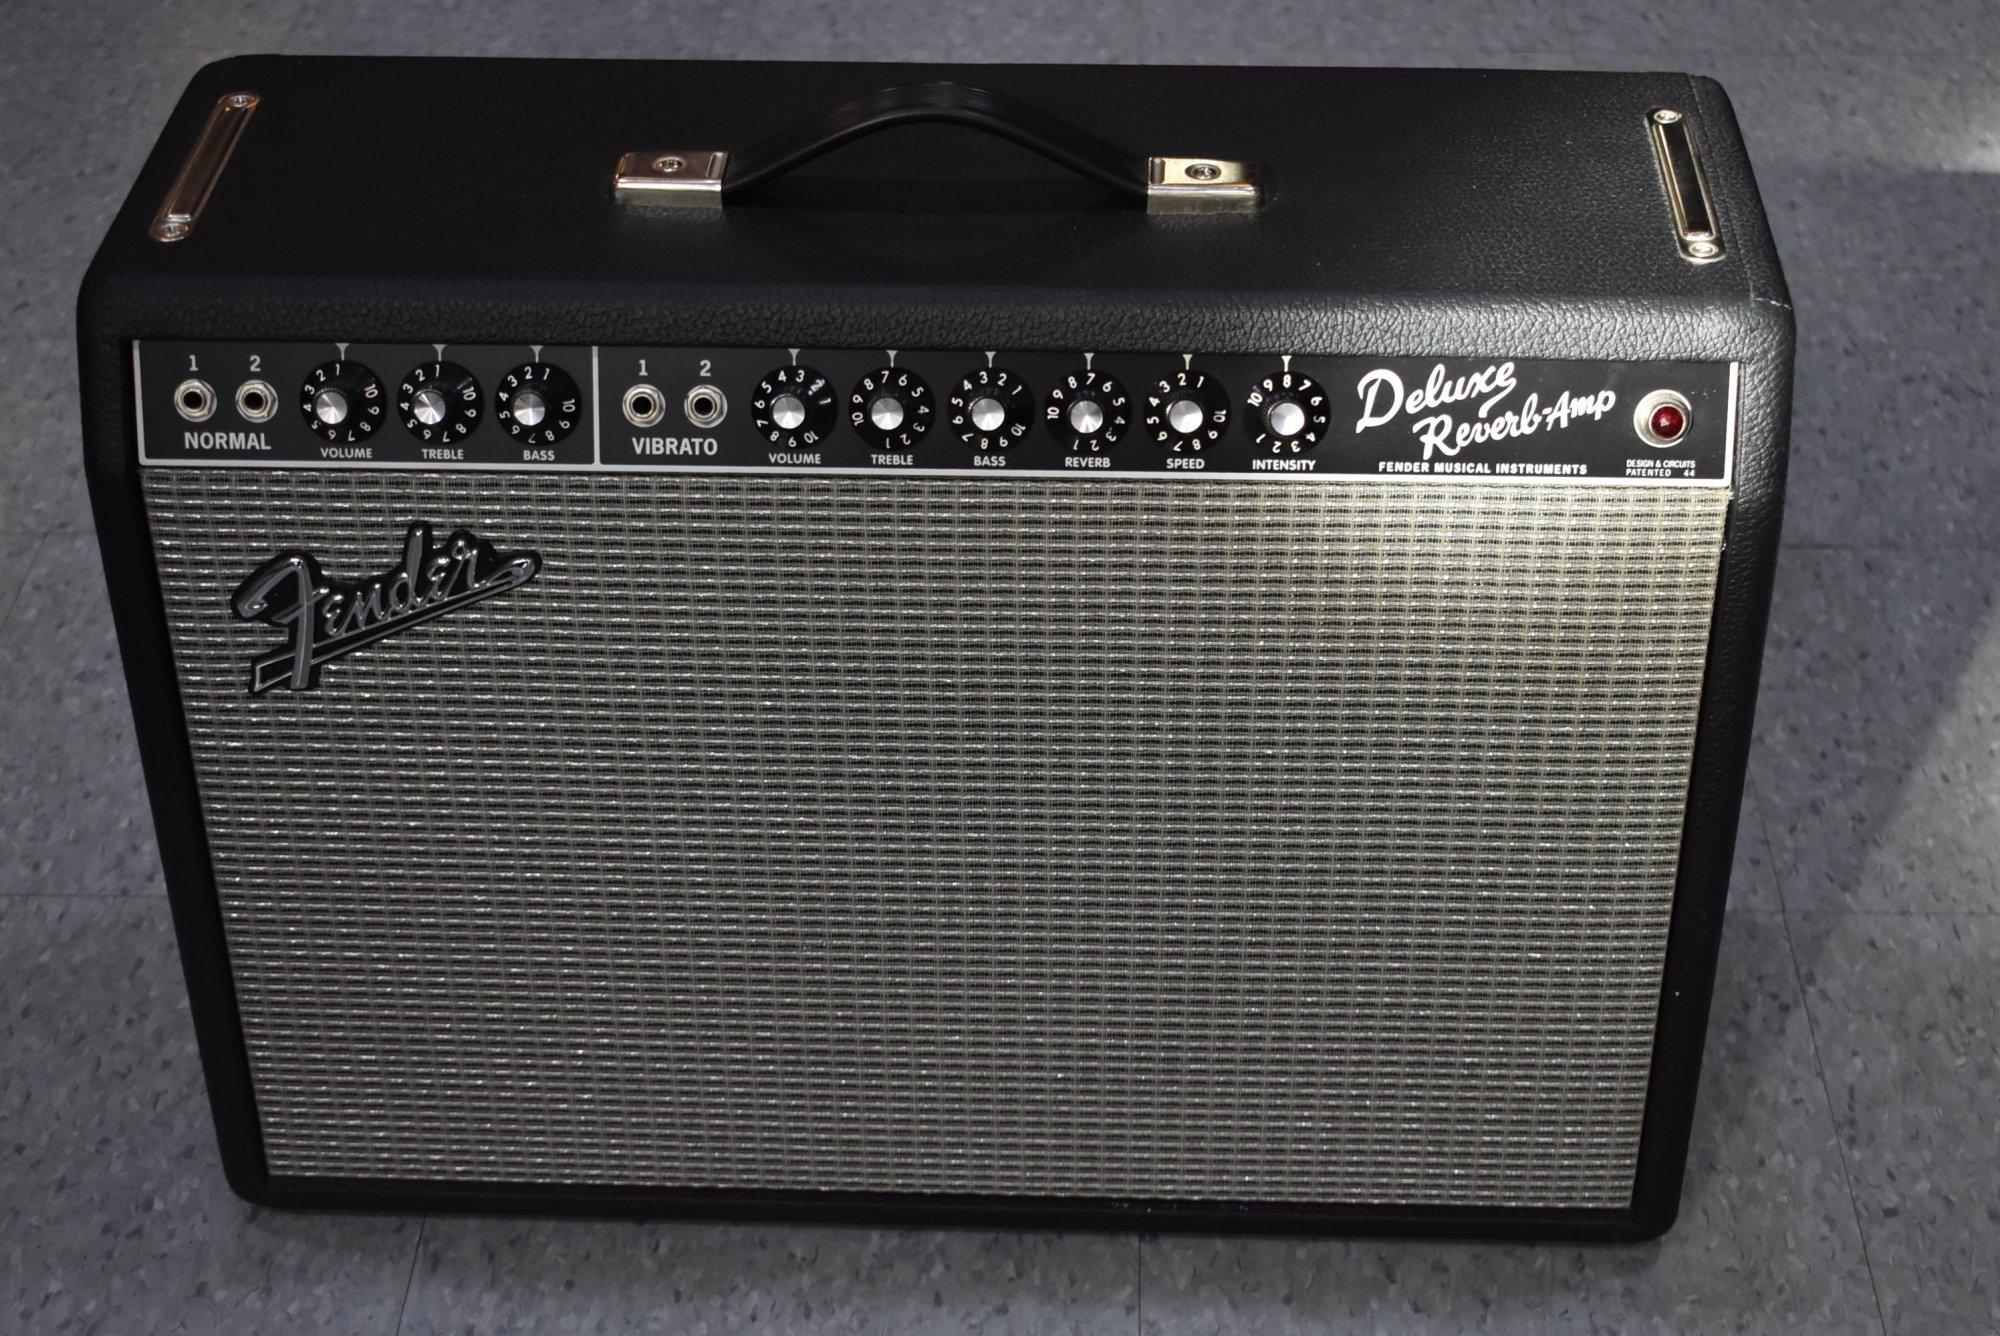 2002 Fender '65 Deluxe Reverb Reissue (Made in USA)